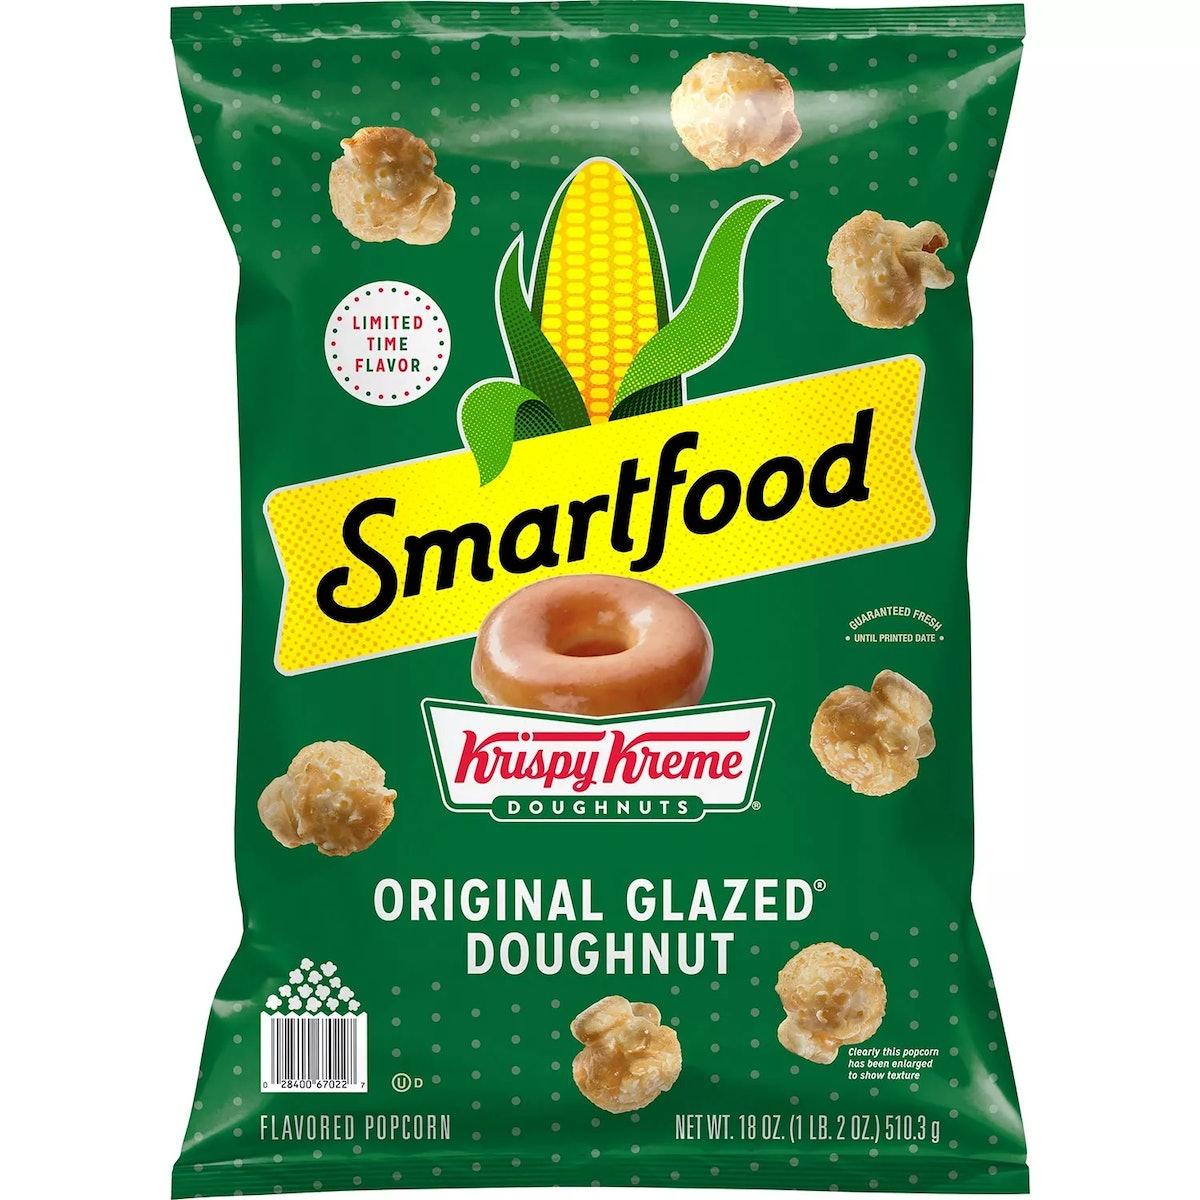 This Smartfood Krispy Kreme Popcorn at Sam's Club tastes like glazed doughnuts.